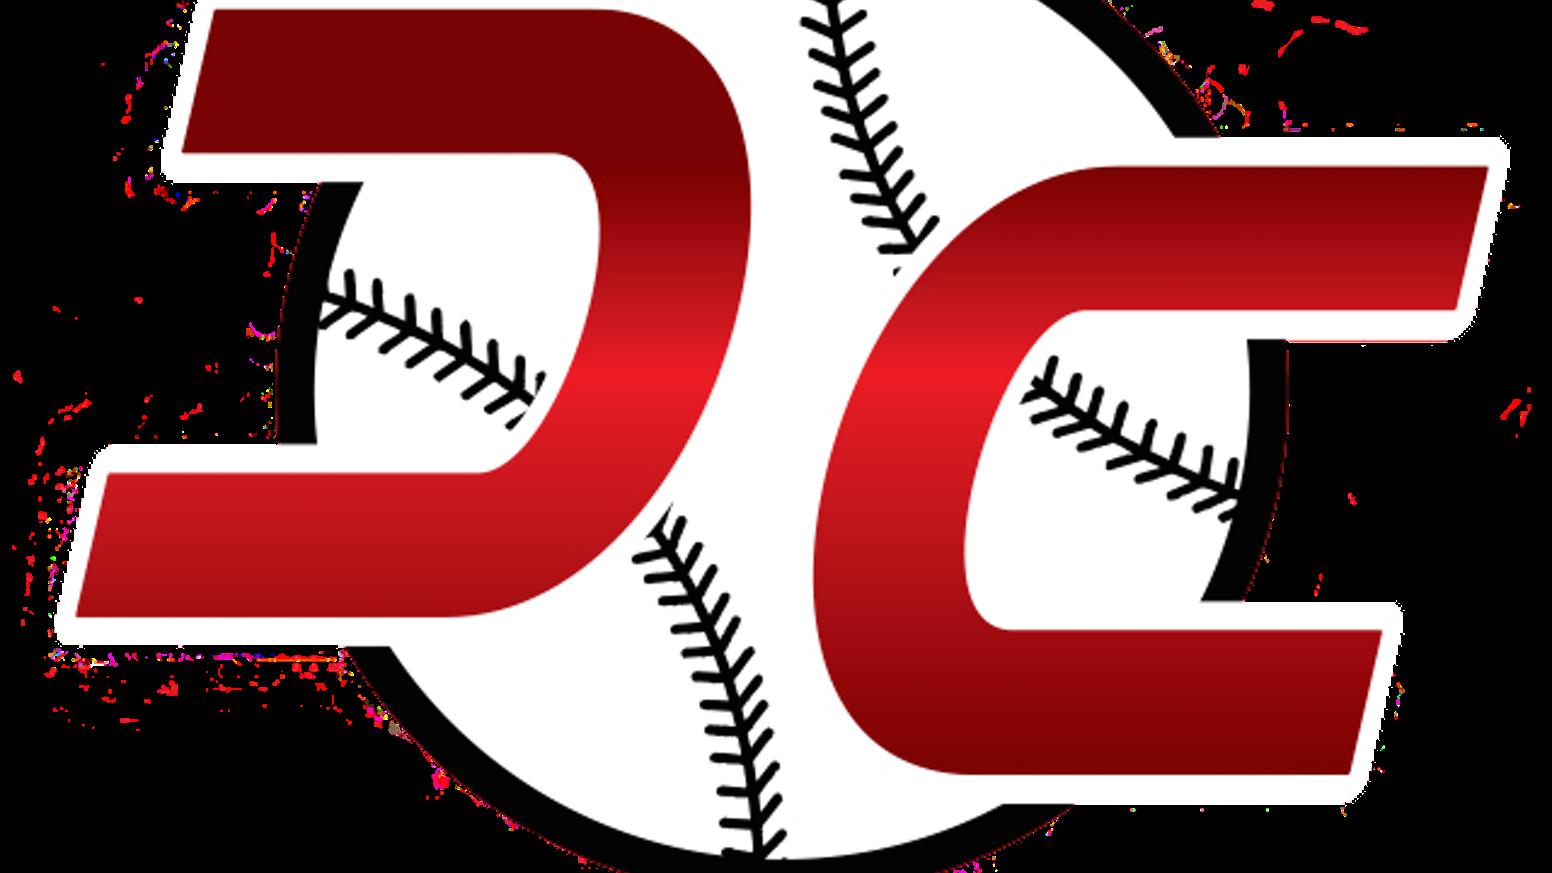 Make baseball fun again. Heartbeat clipart softball